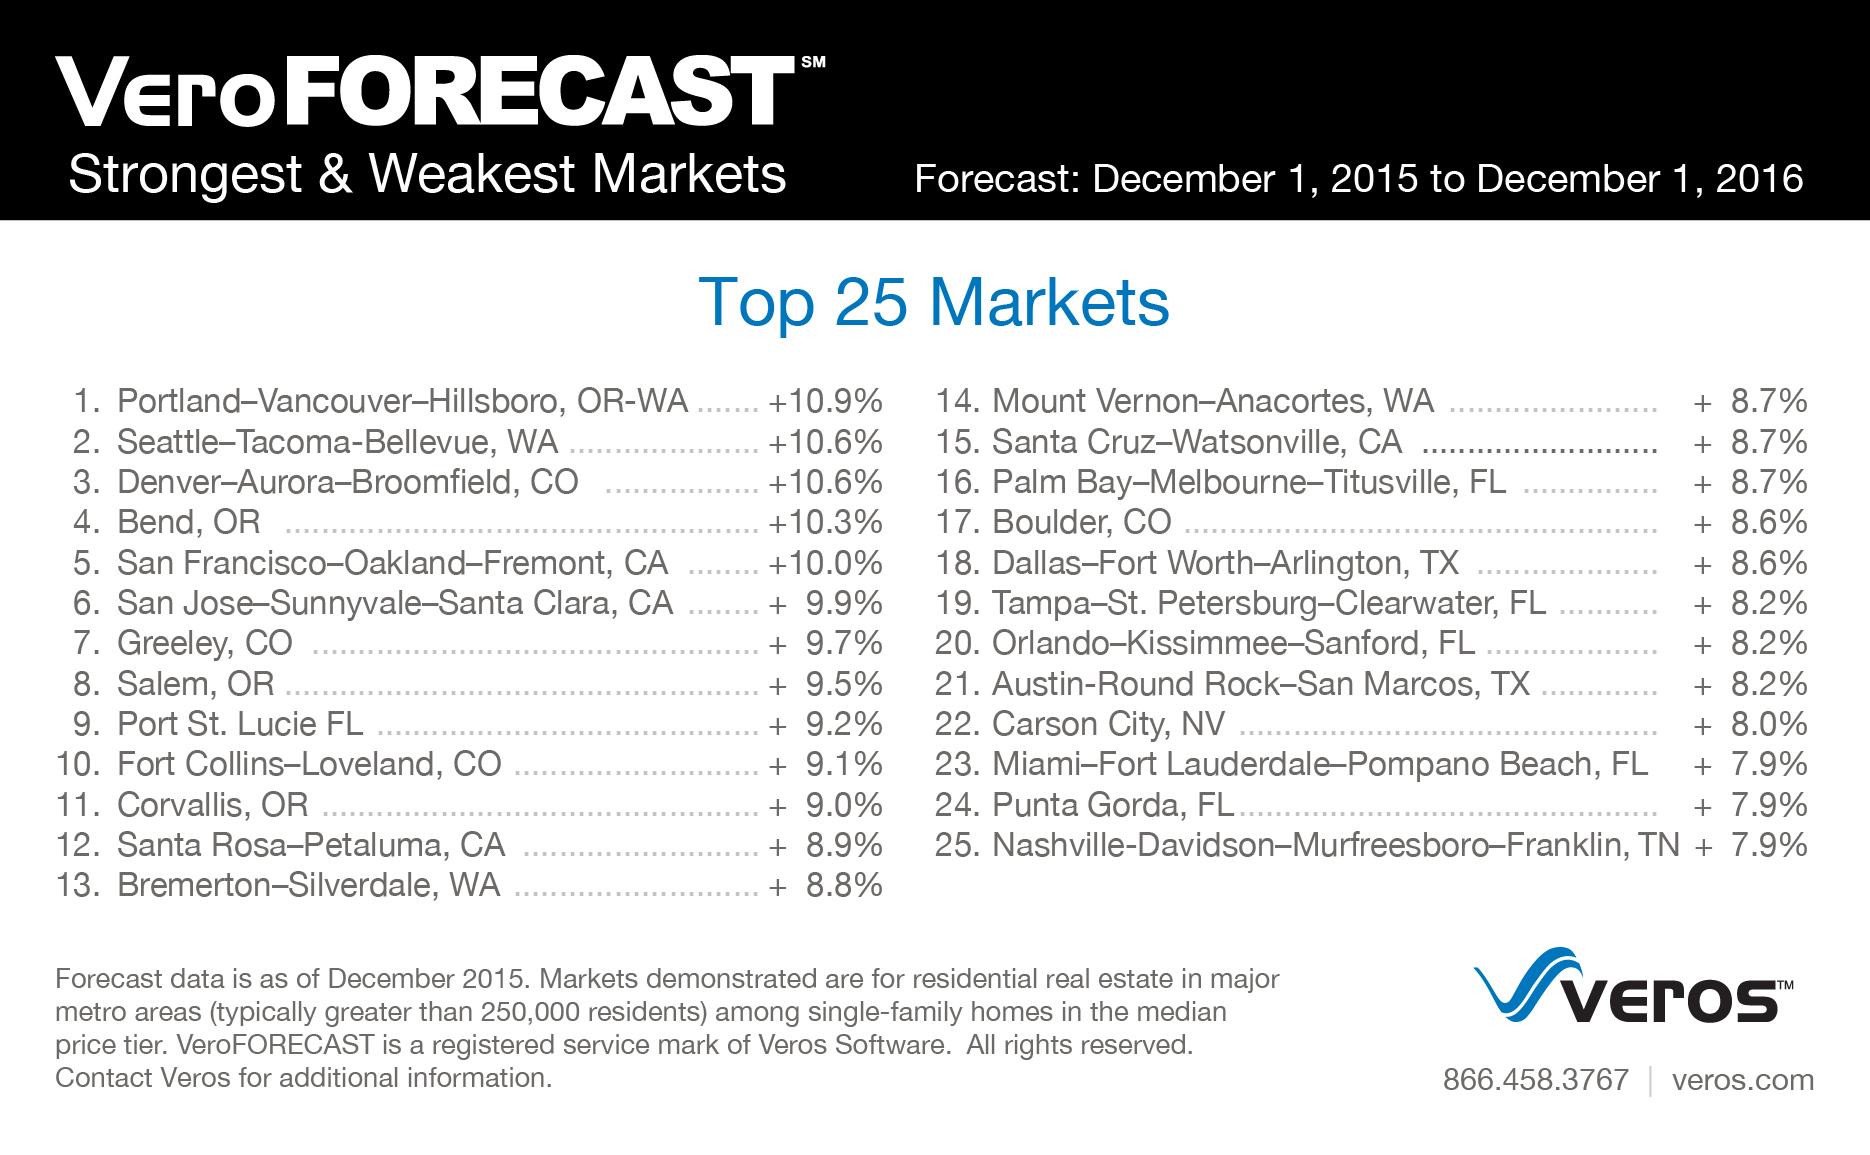 Veros 2016 strongest markets